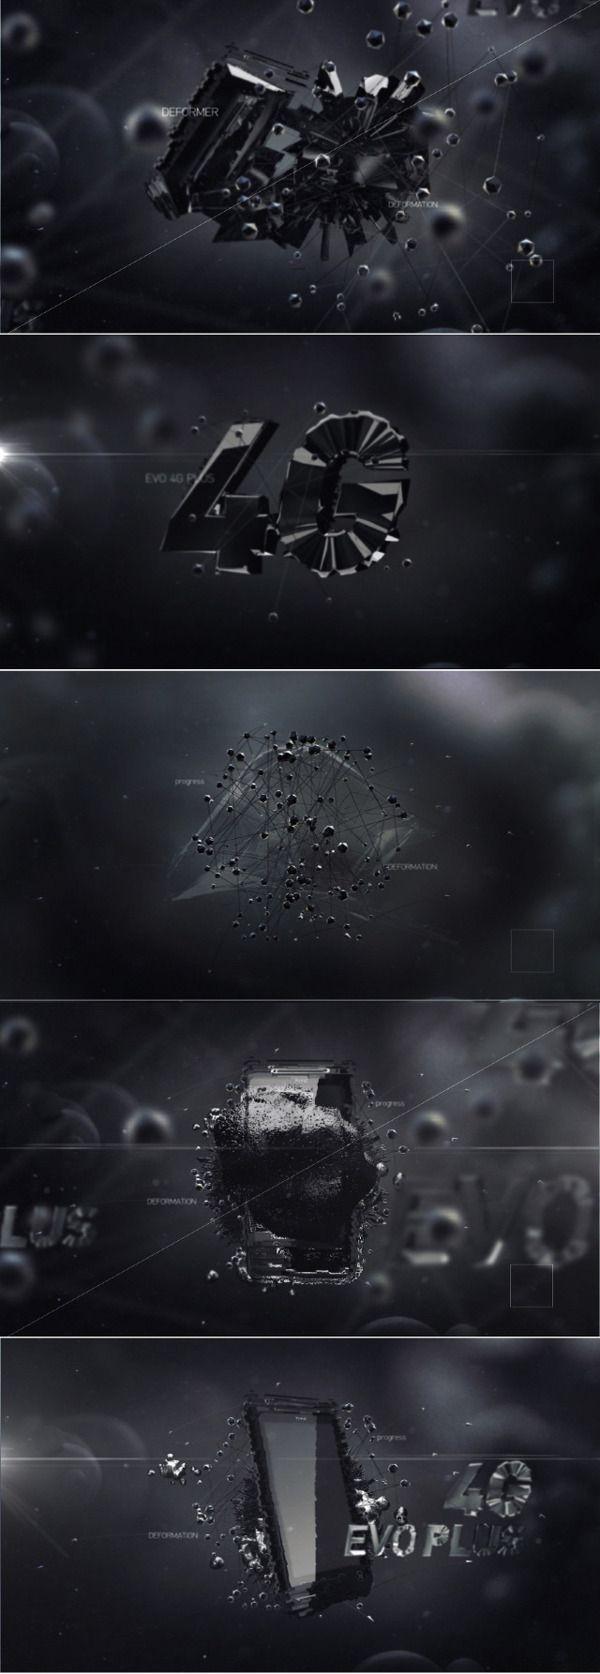 HTC Evo 4g plus by taiho roh, via Behance